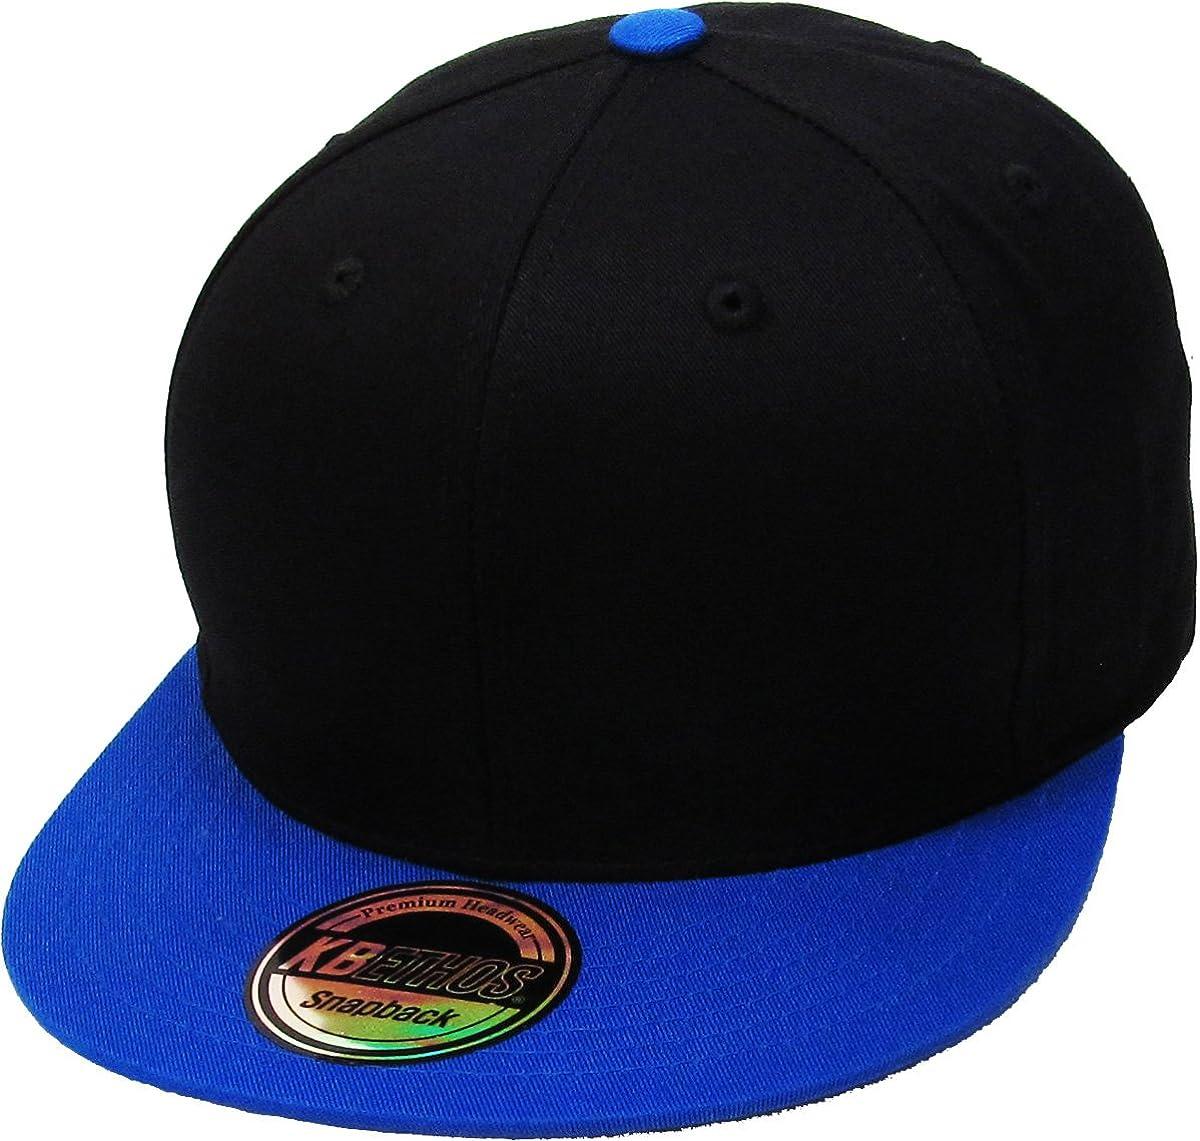 Classic Snapback Hat Blank Cap - Cotton & Wool Blend Flat Visor